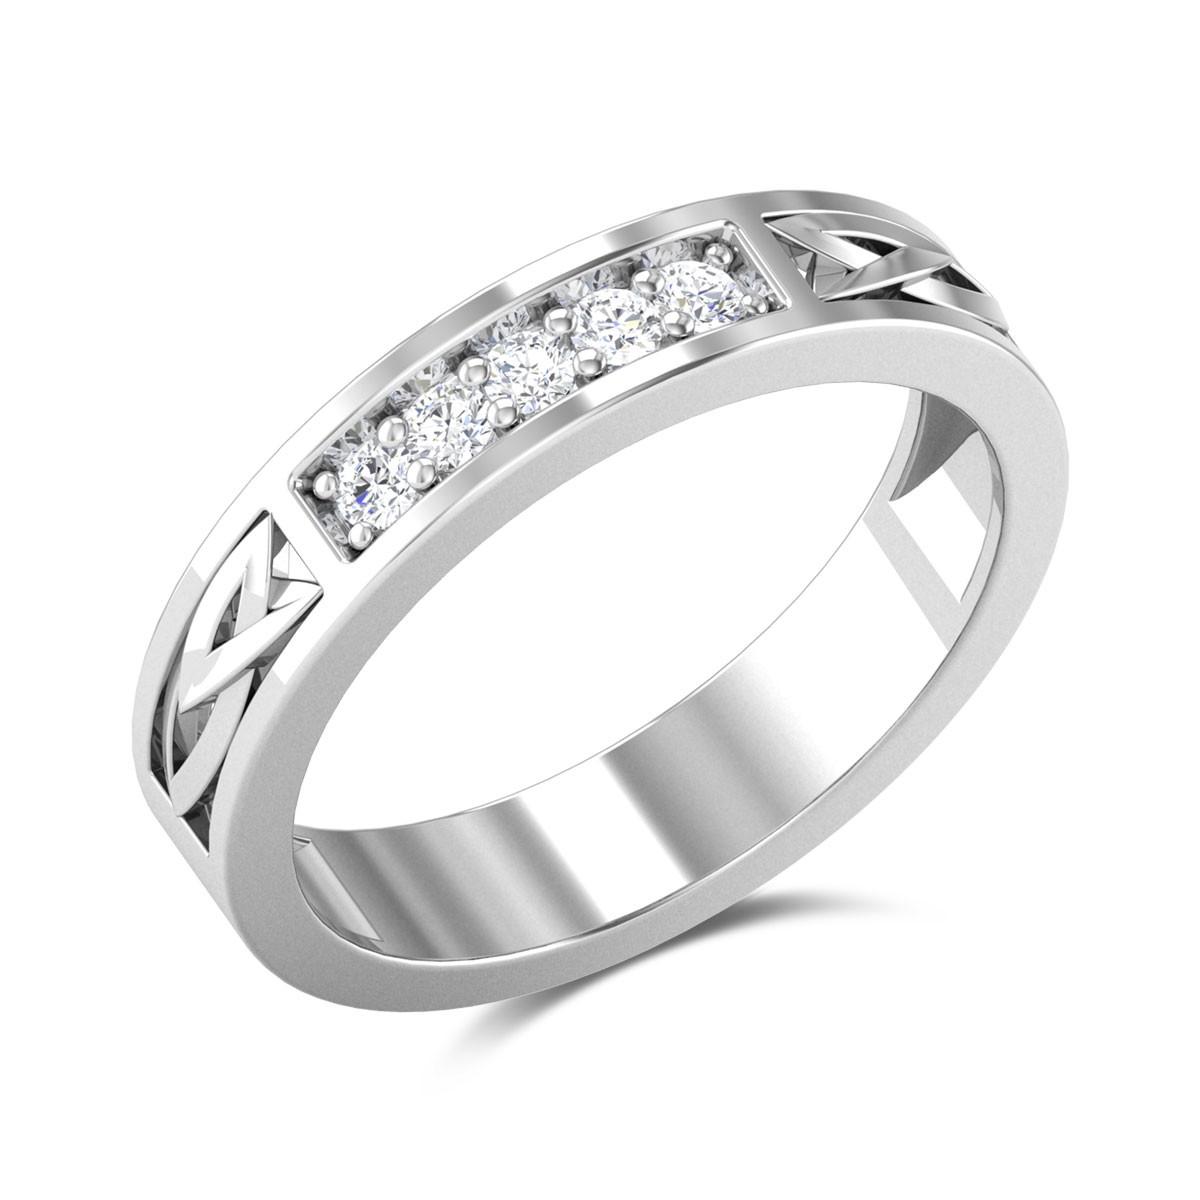 Fionnula Diamond Ring